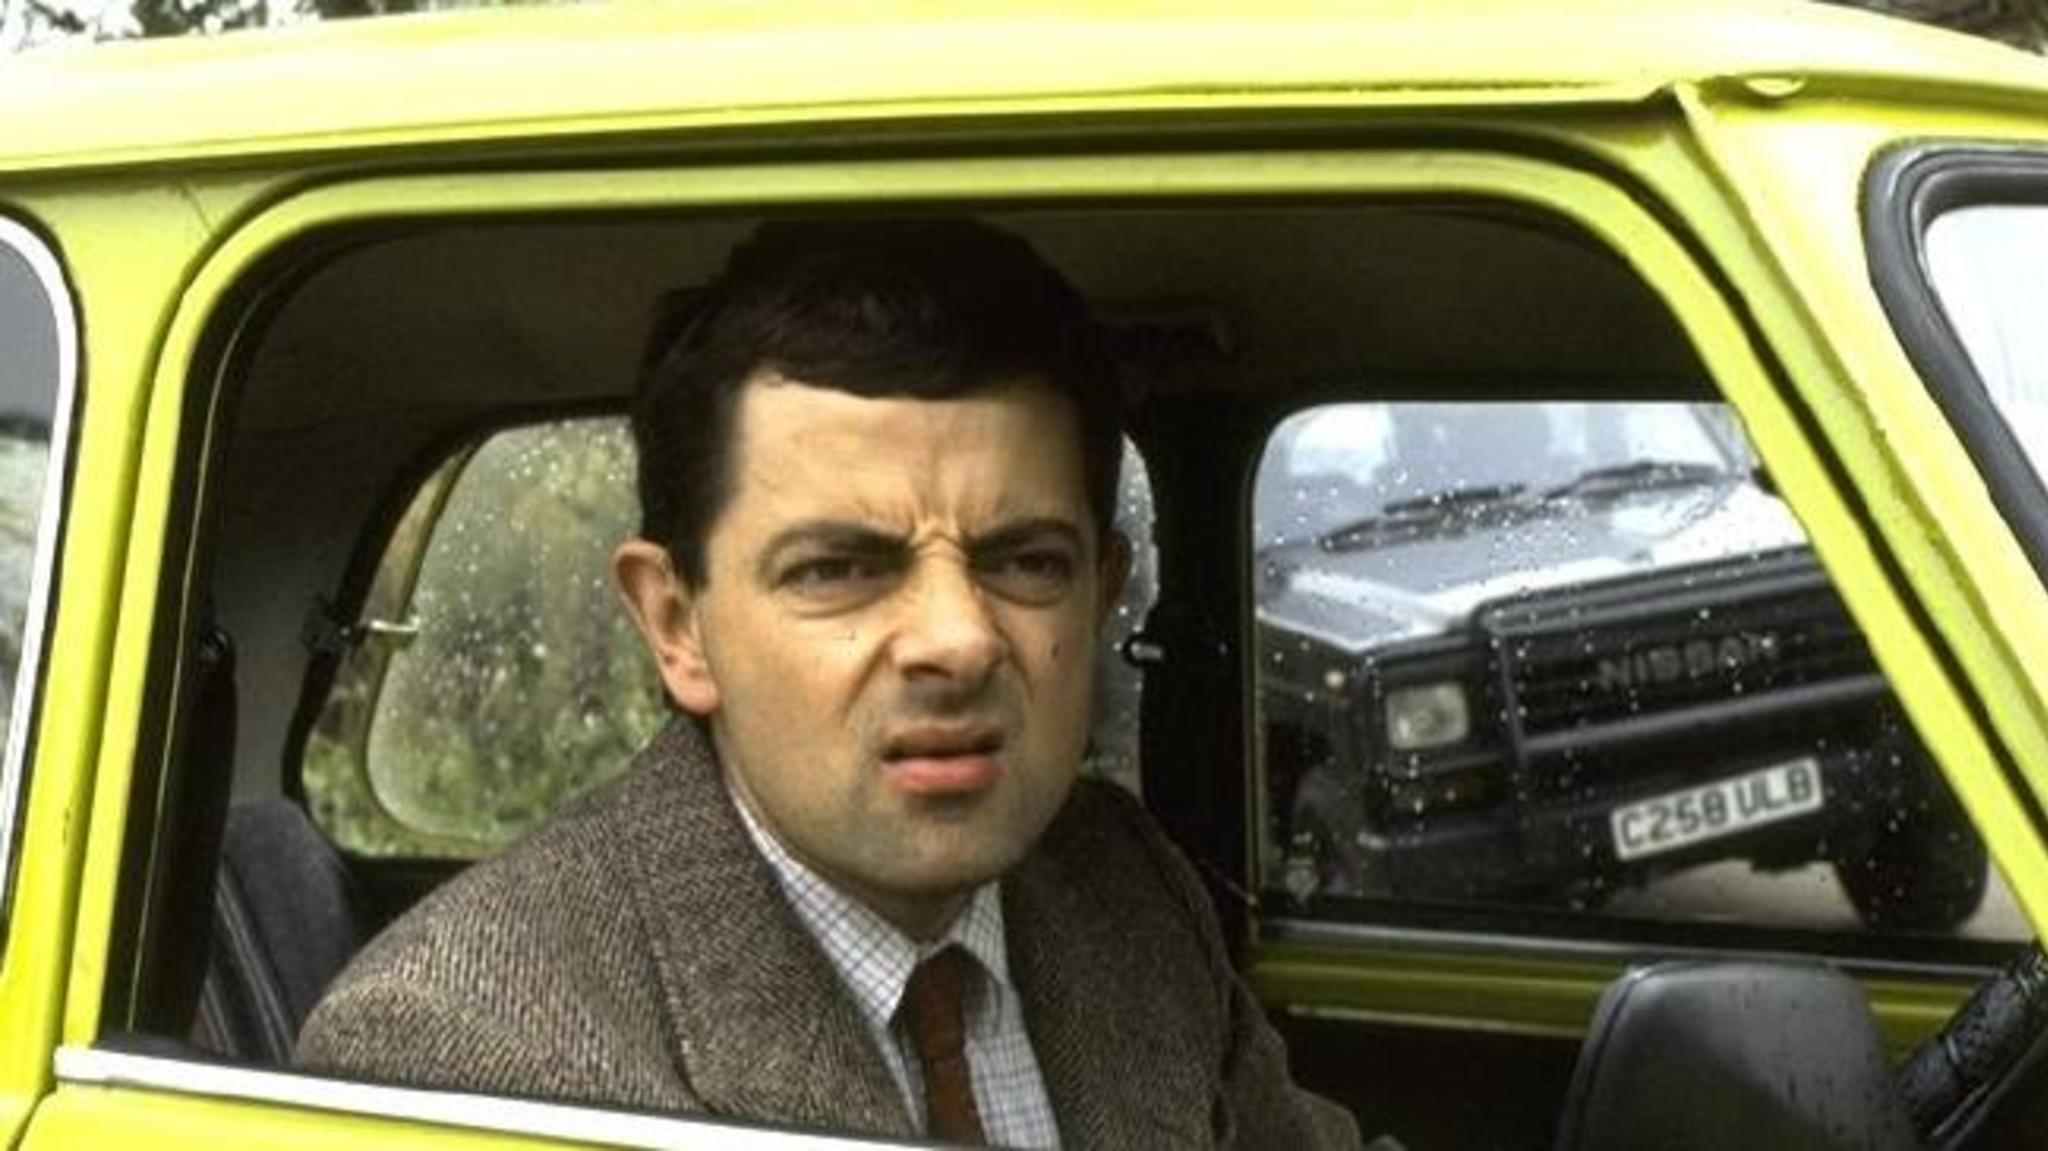 Mr Bean Sqinting